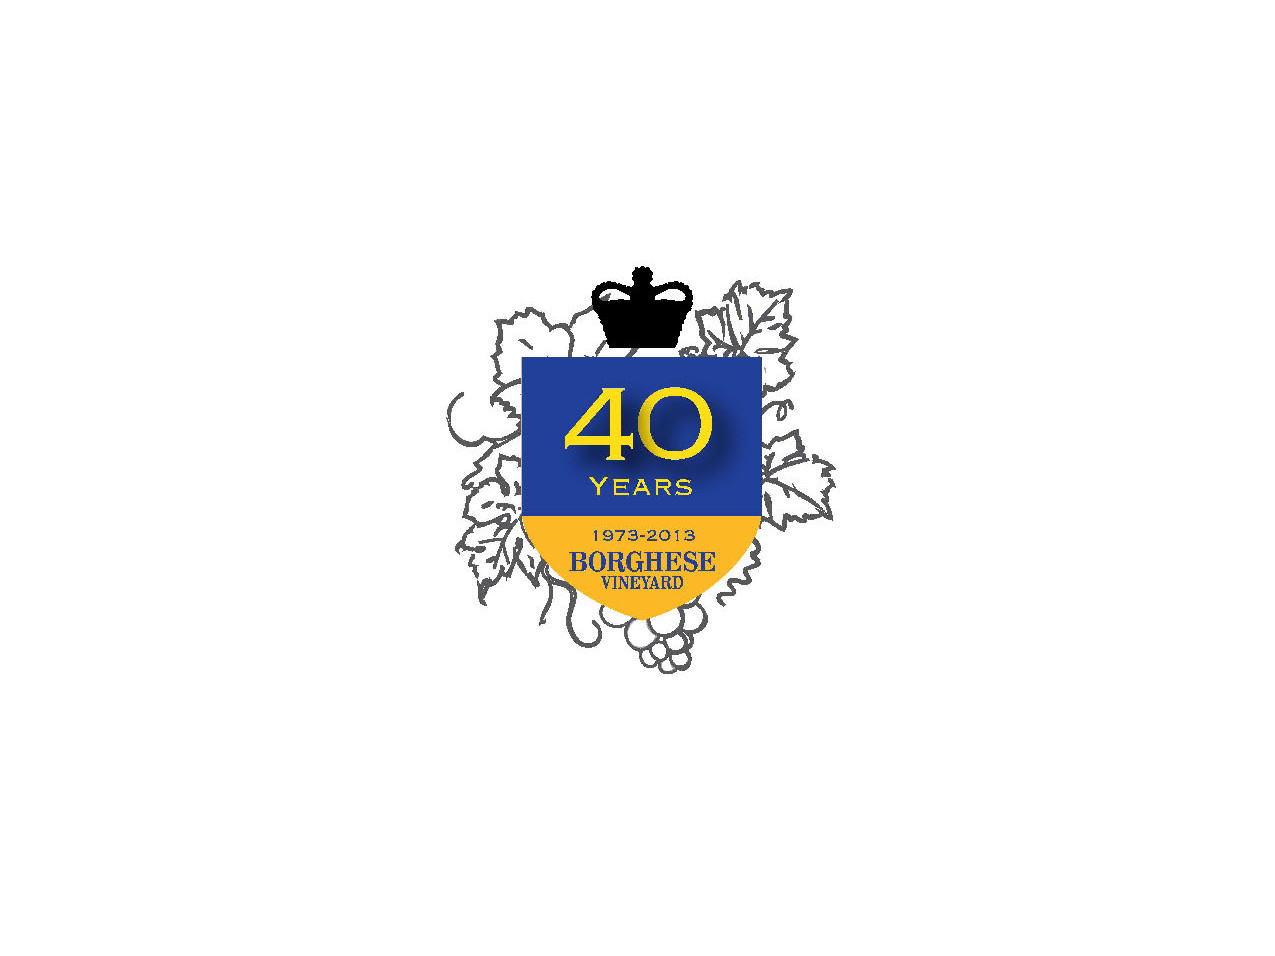 Borghese Vineyard 40th Emblem